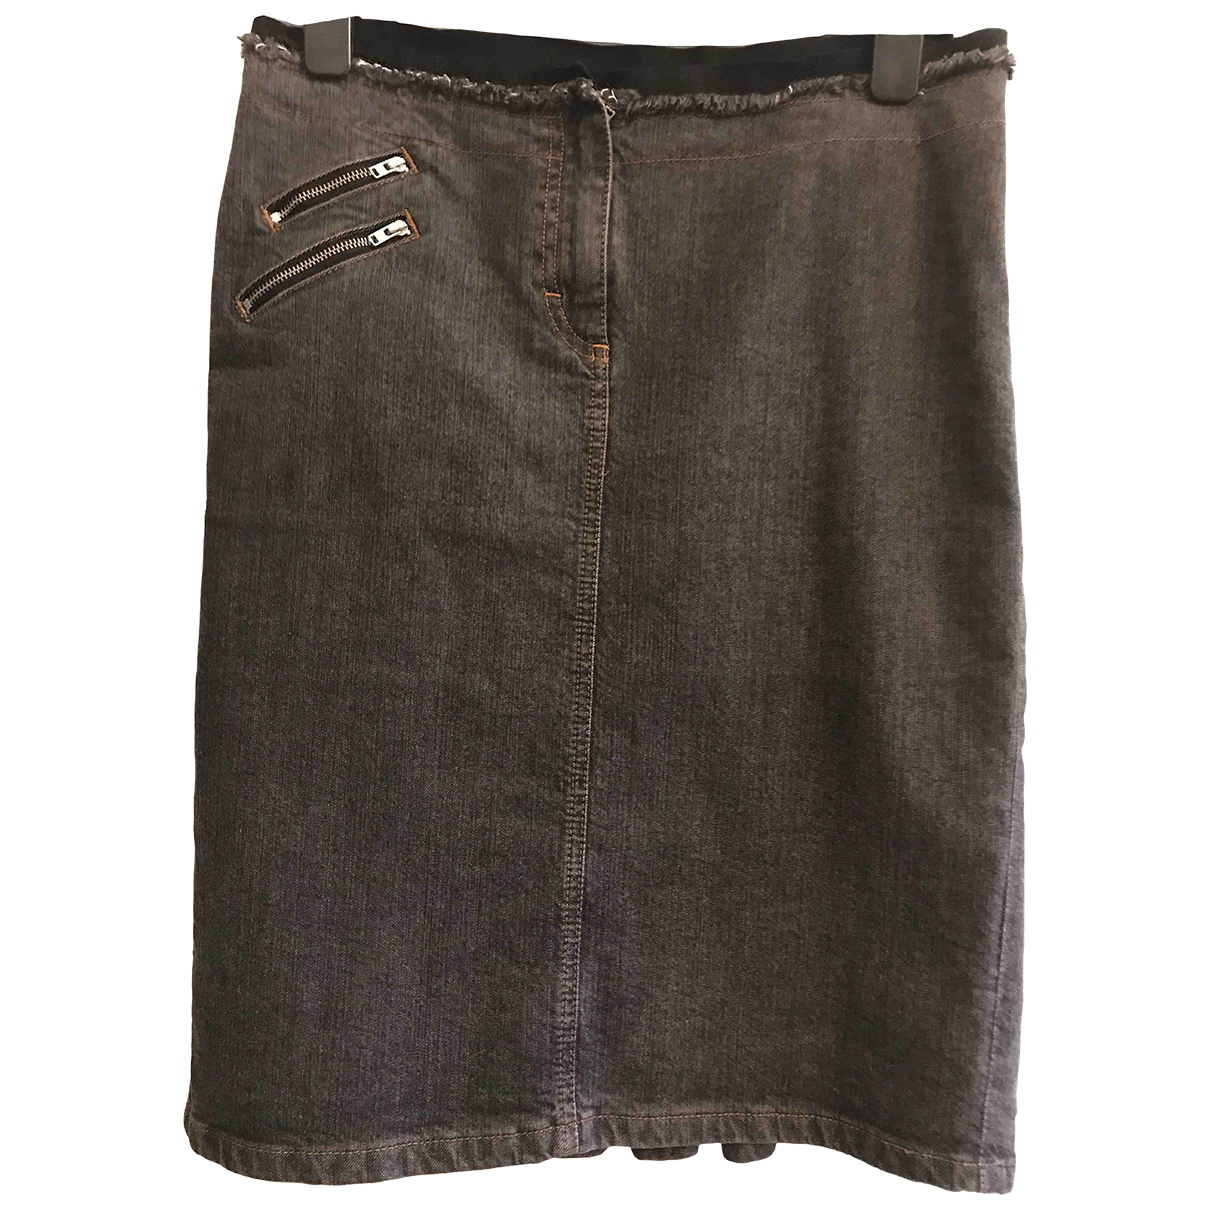 Blumarine \N Grey Denim - Jeans skirt for Women 42 IT